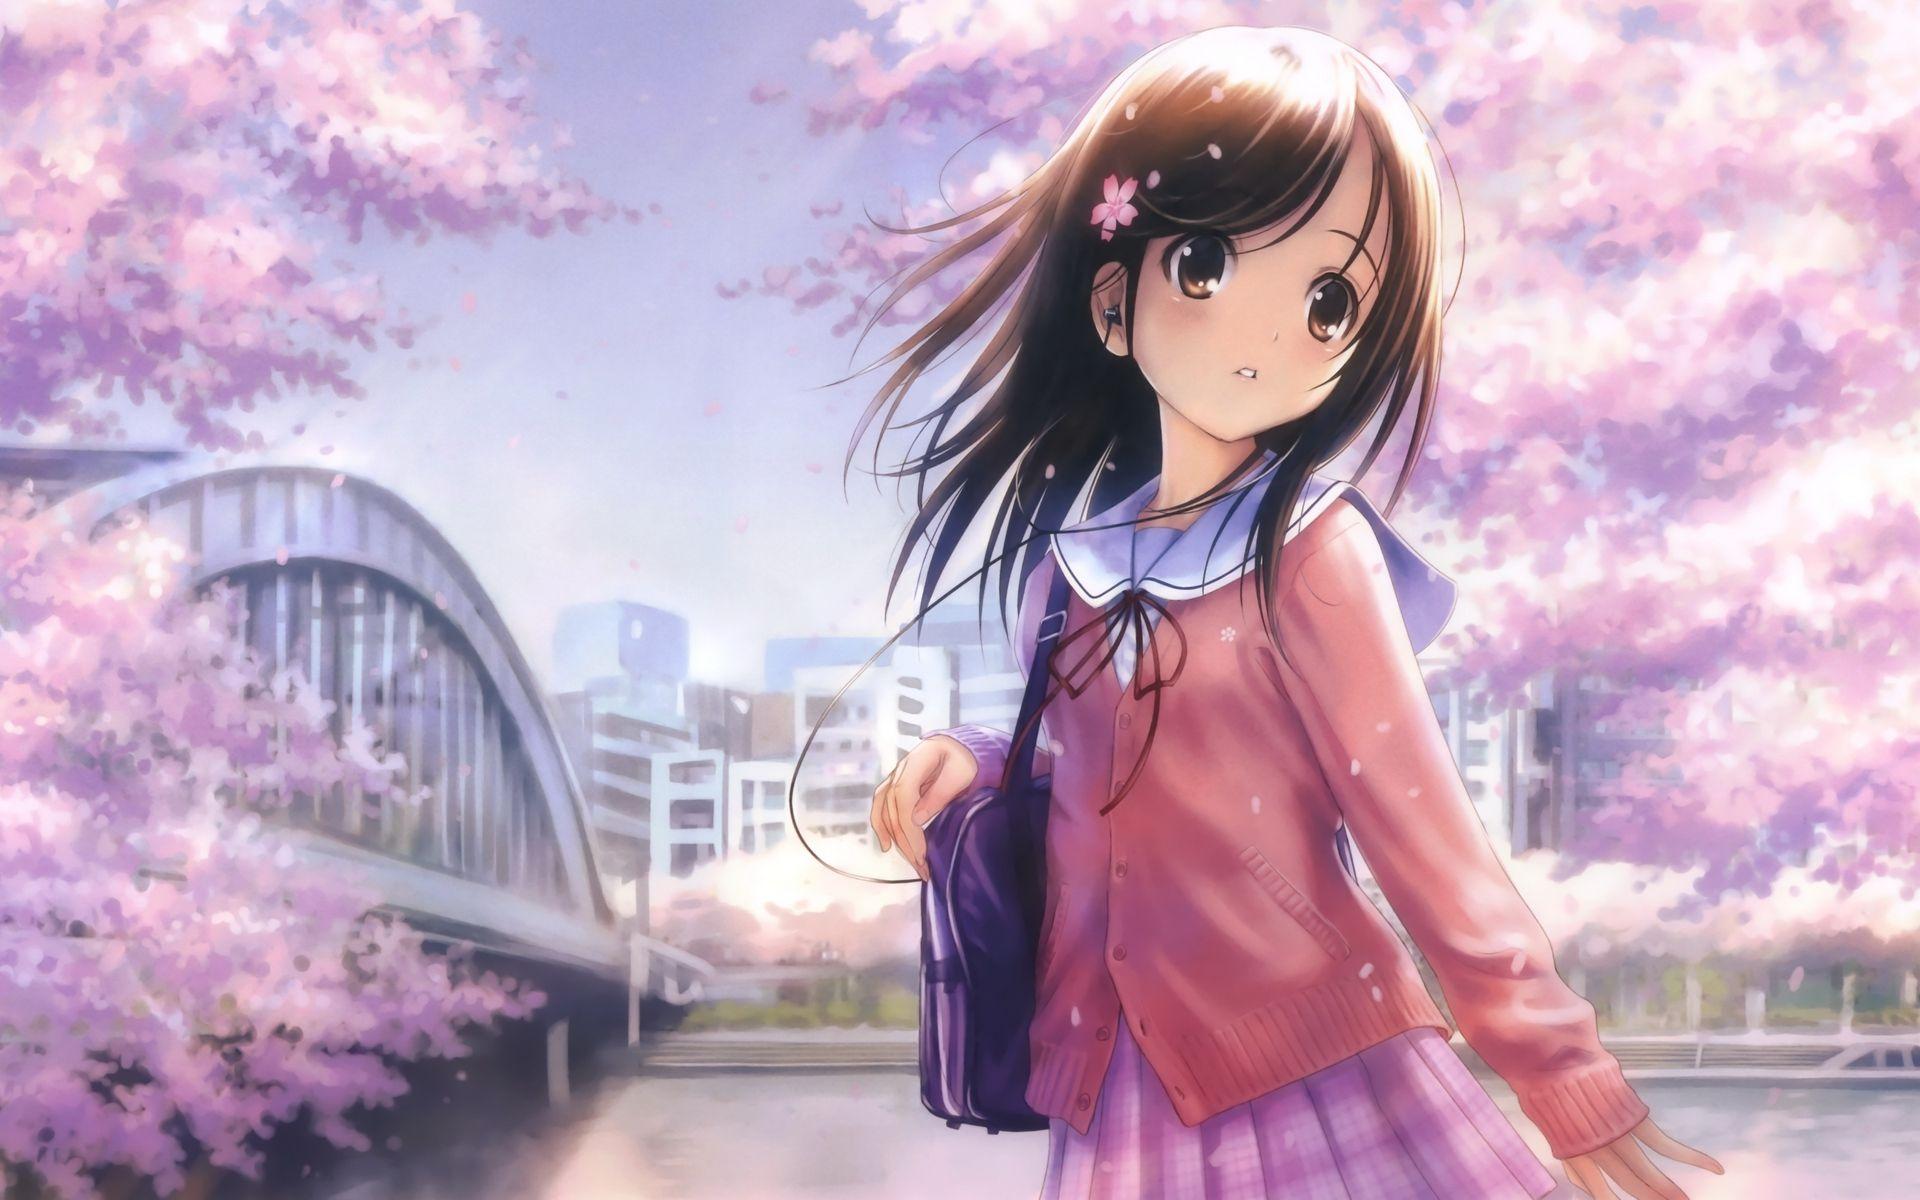 Cute Anime Princess Wallpaper